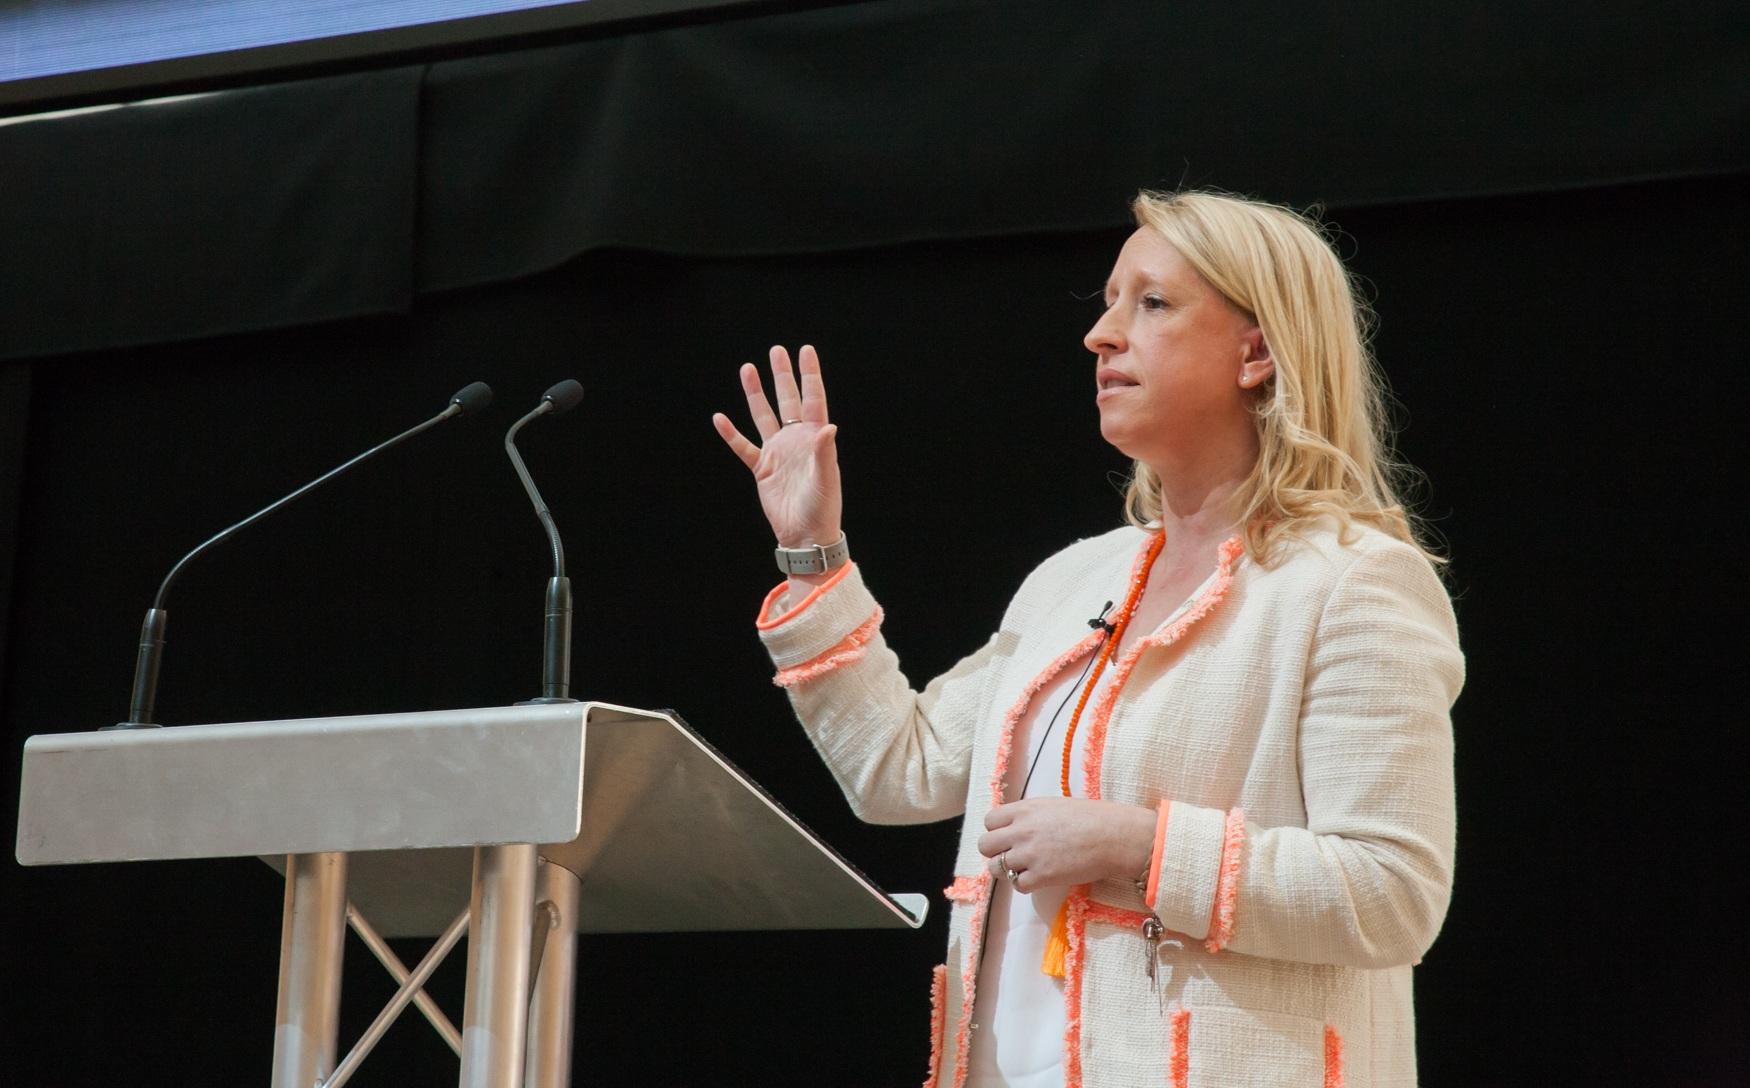 Amanda+Reynolds+Global+Partnership+Director+Executive+Search+UK.jpg